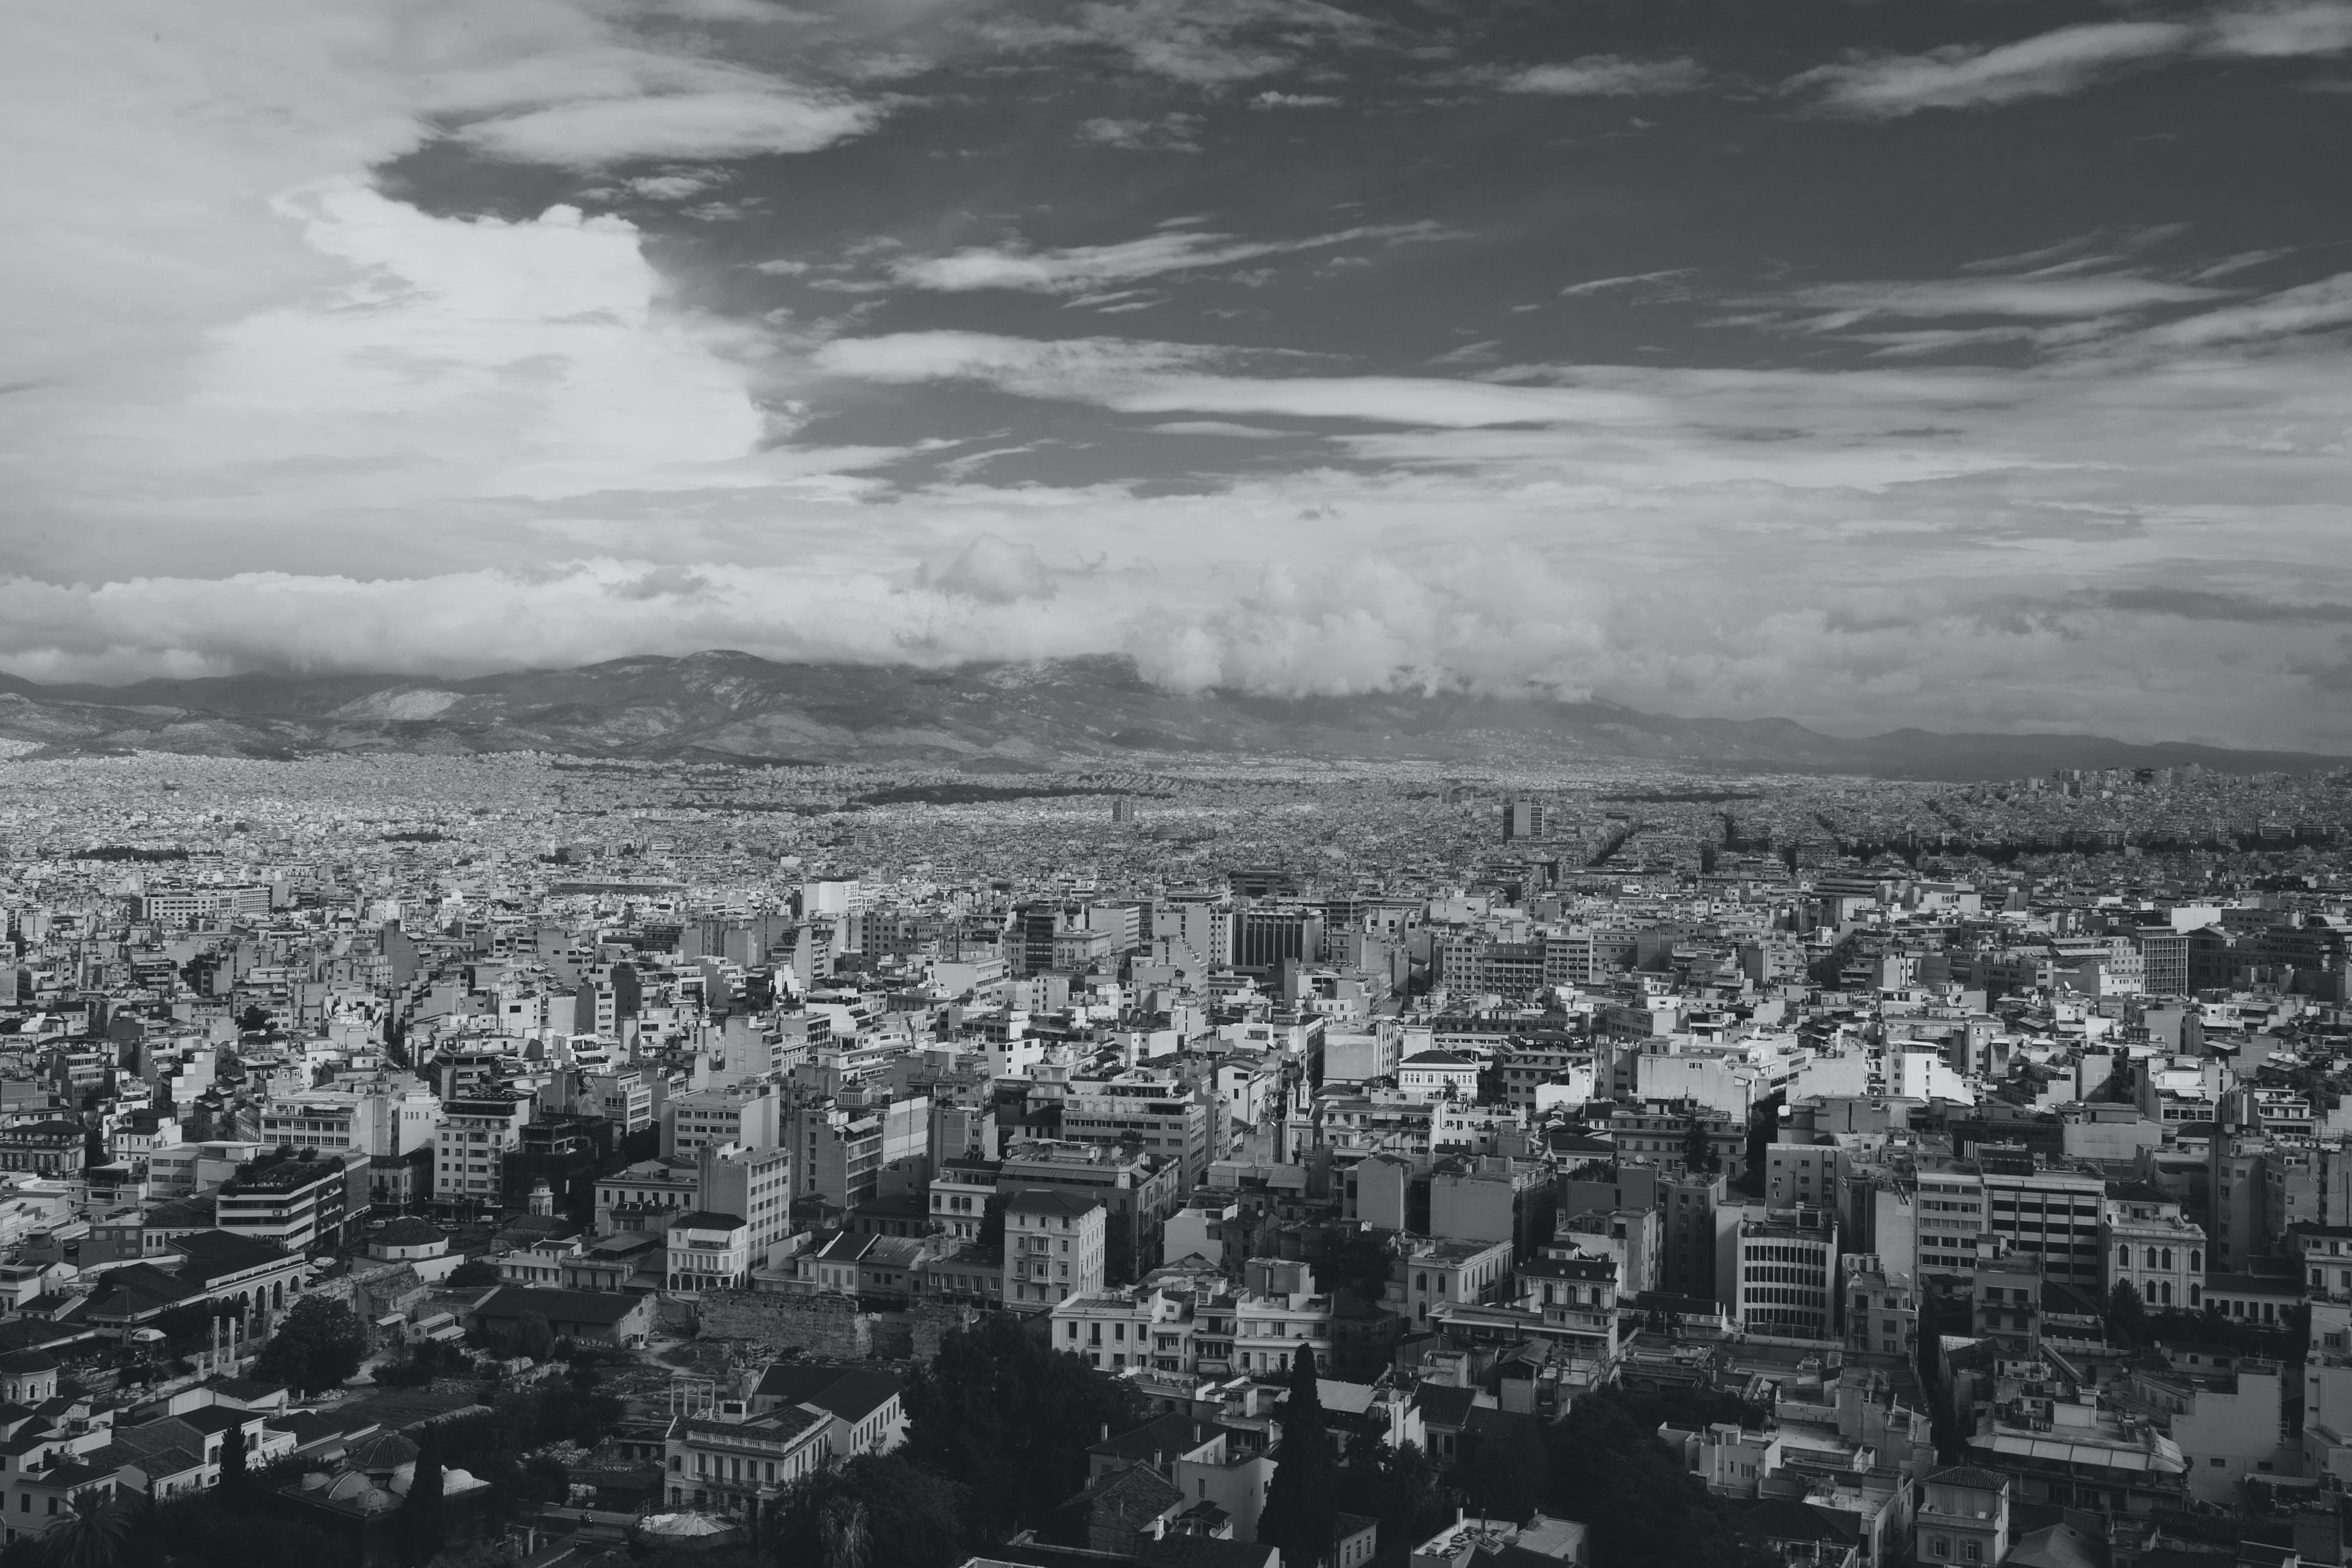 Monochrome Photography of City